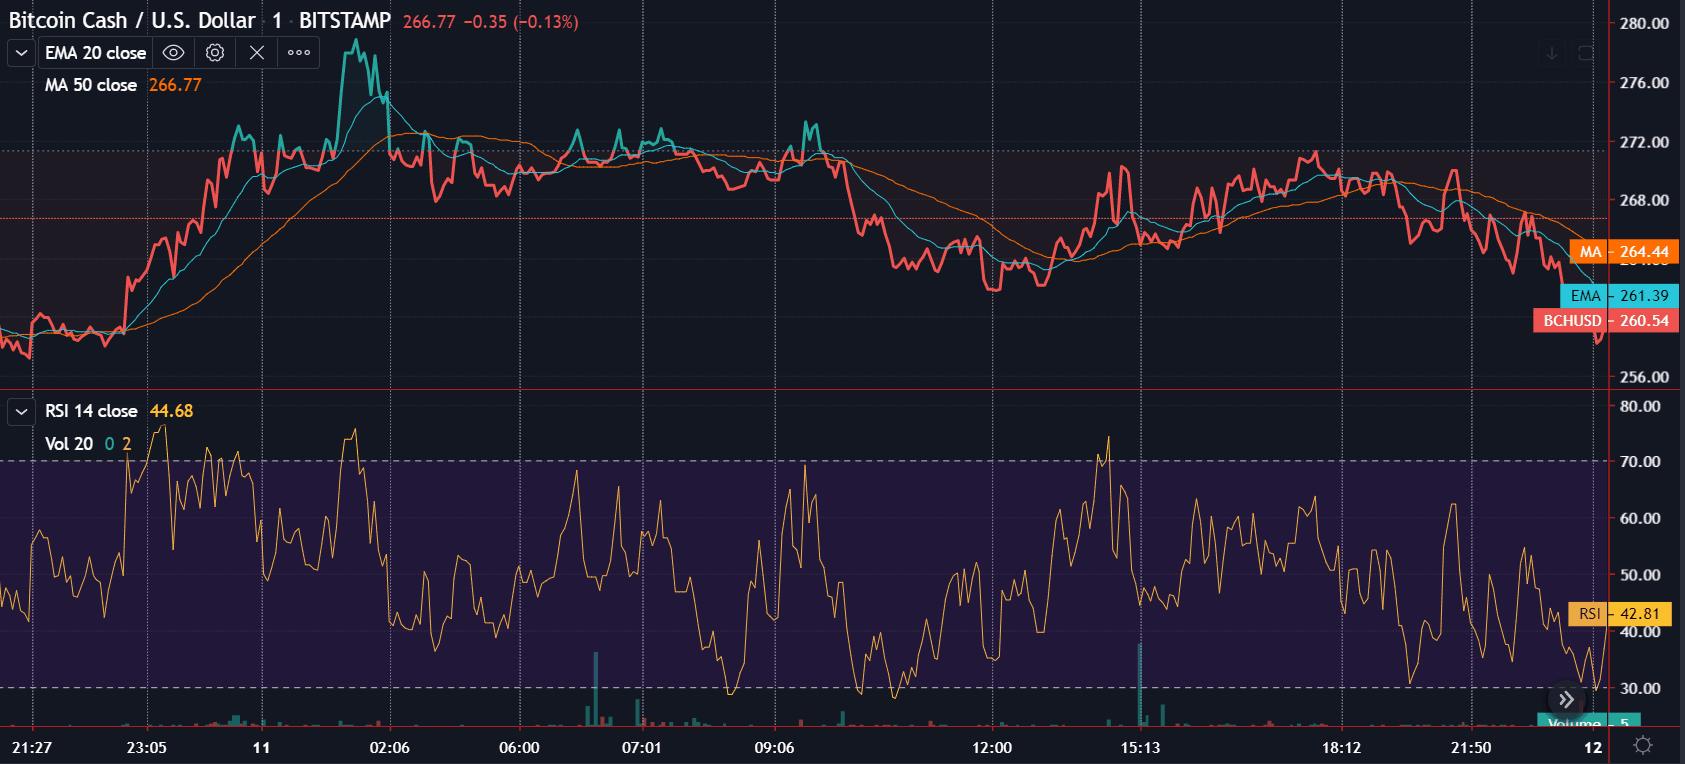 bch price trading